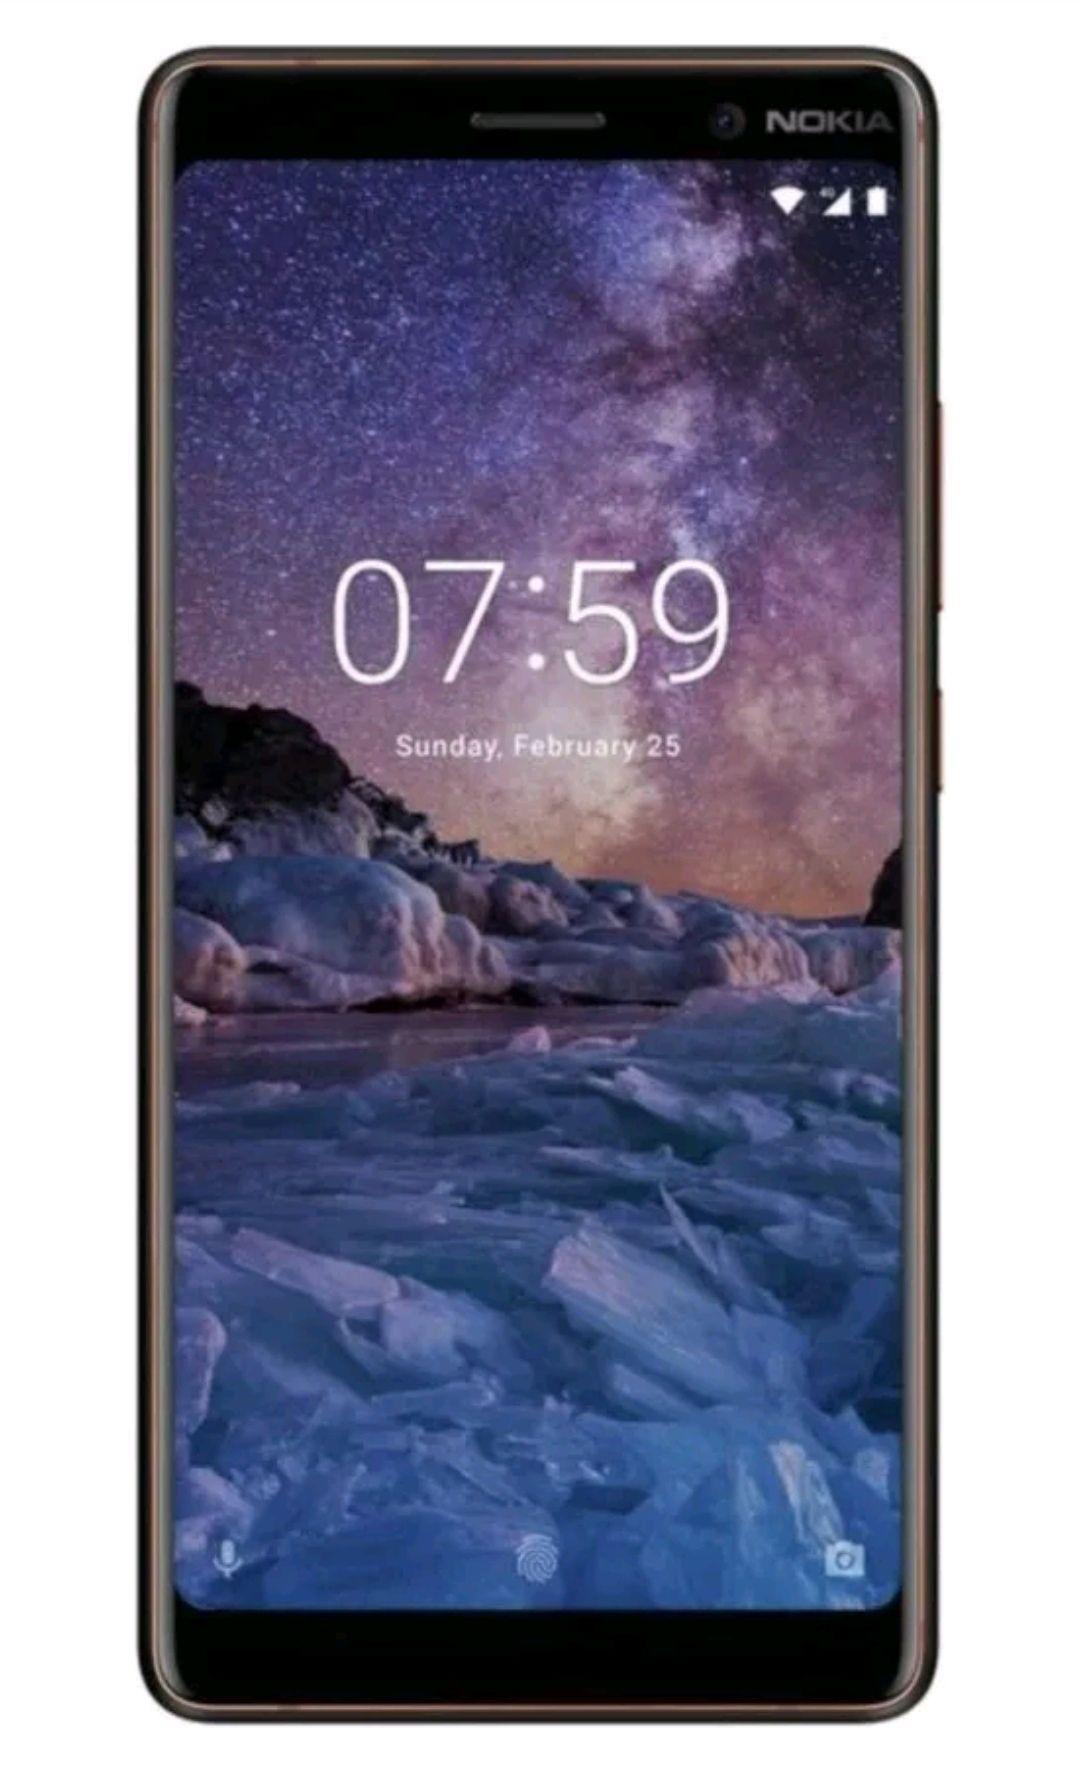 SIM Free Nokia 7 Plus 6 Inch 24MP 64GB 4GB 4G Mobile Phone - Black/CopperRefurbished with a 12 month Argos guarantee - £199.99 @ Argos Ebay